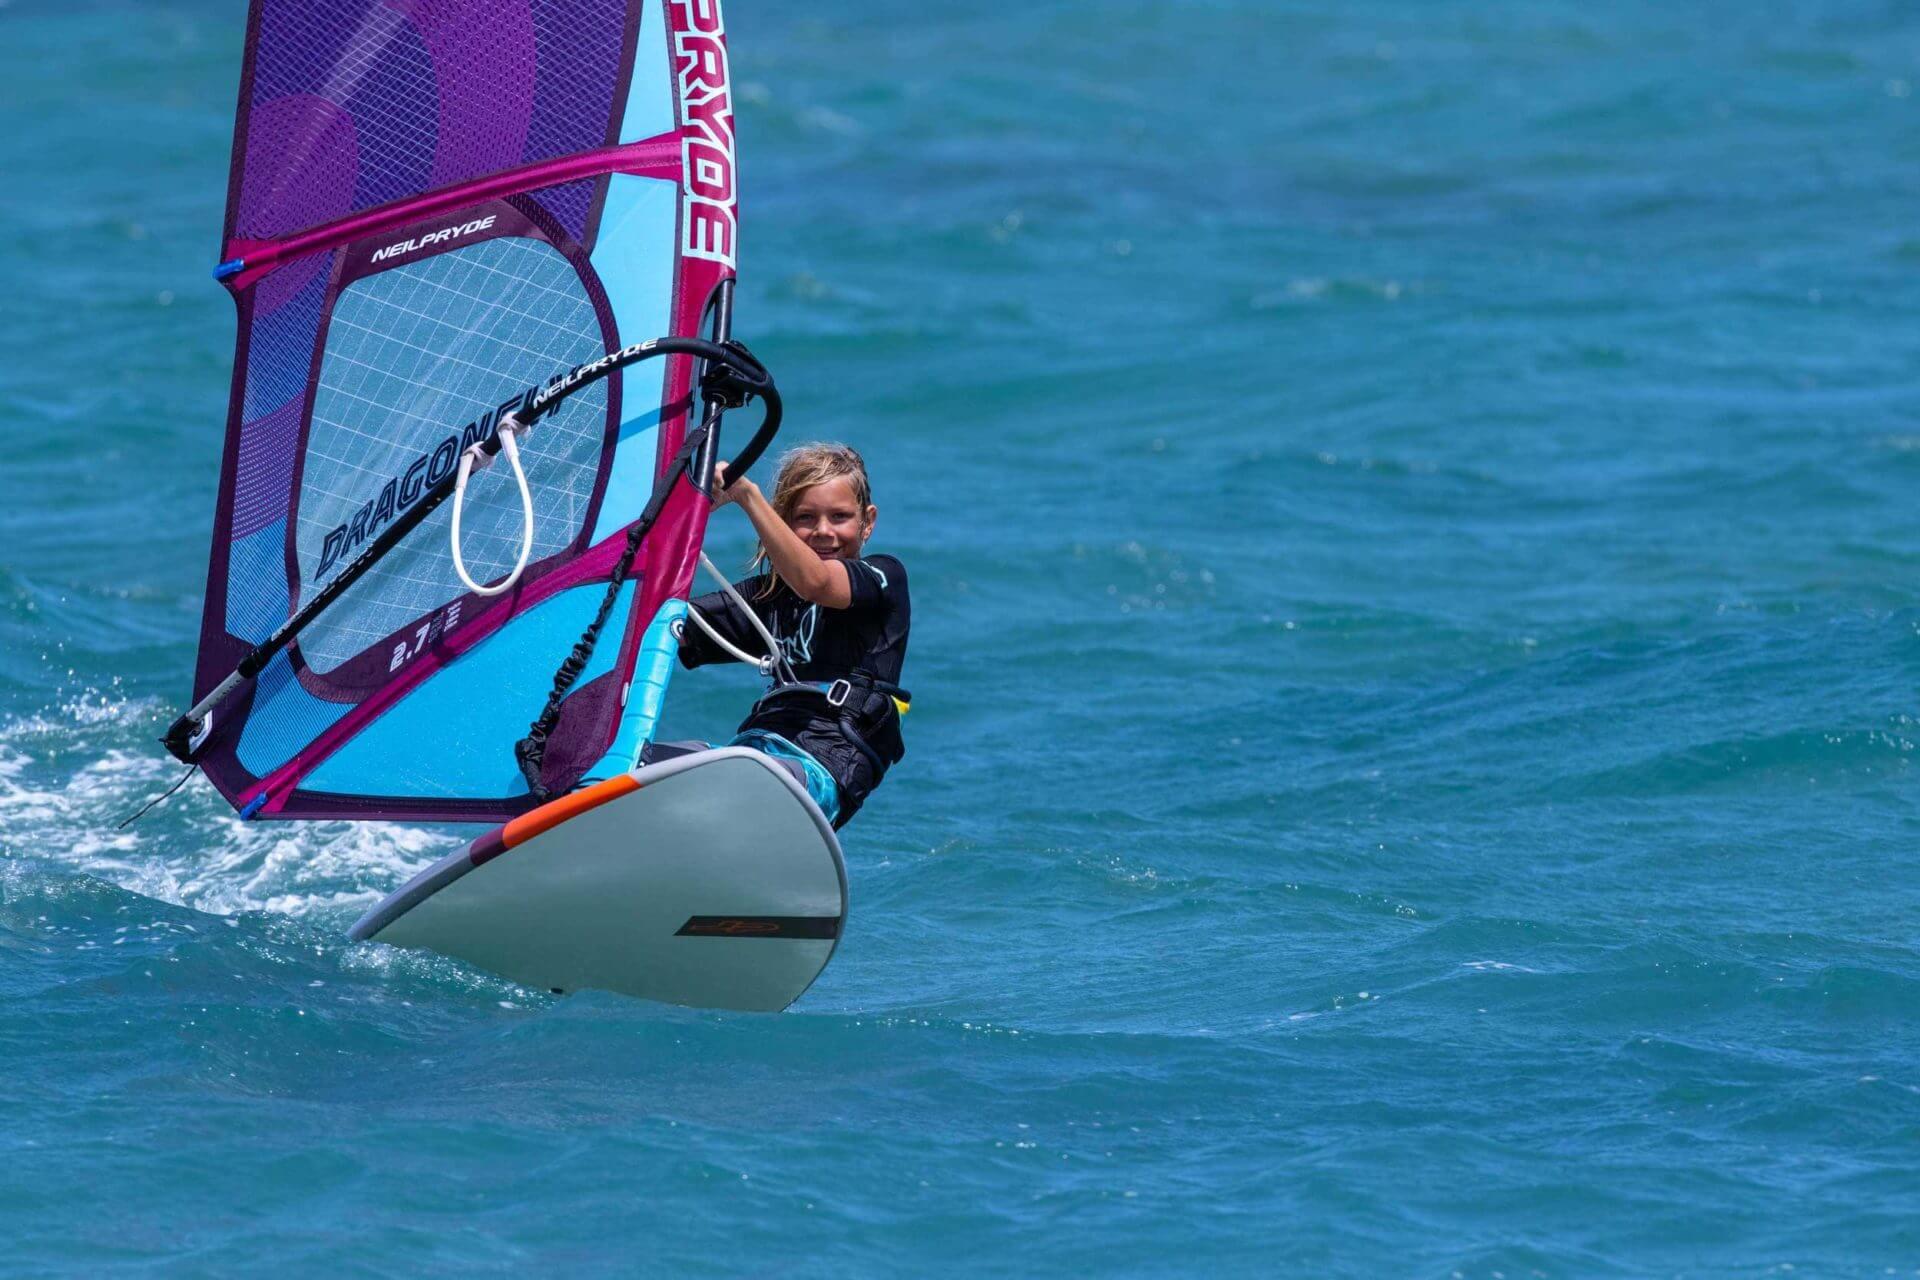 pevny-windsurf-jp-australia-2